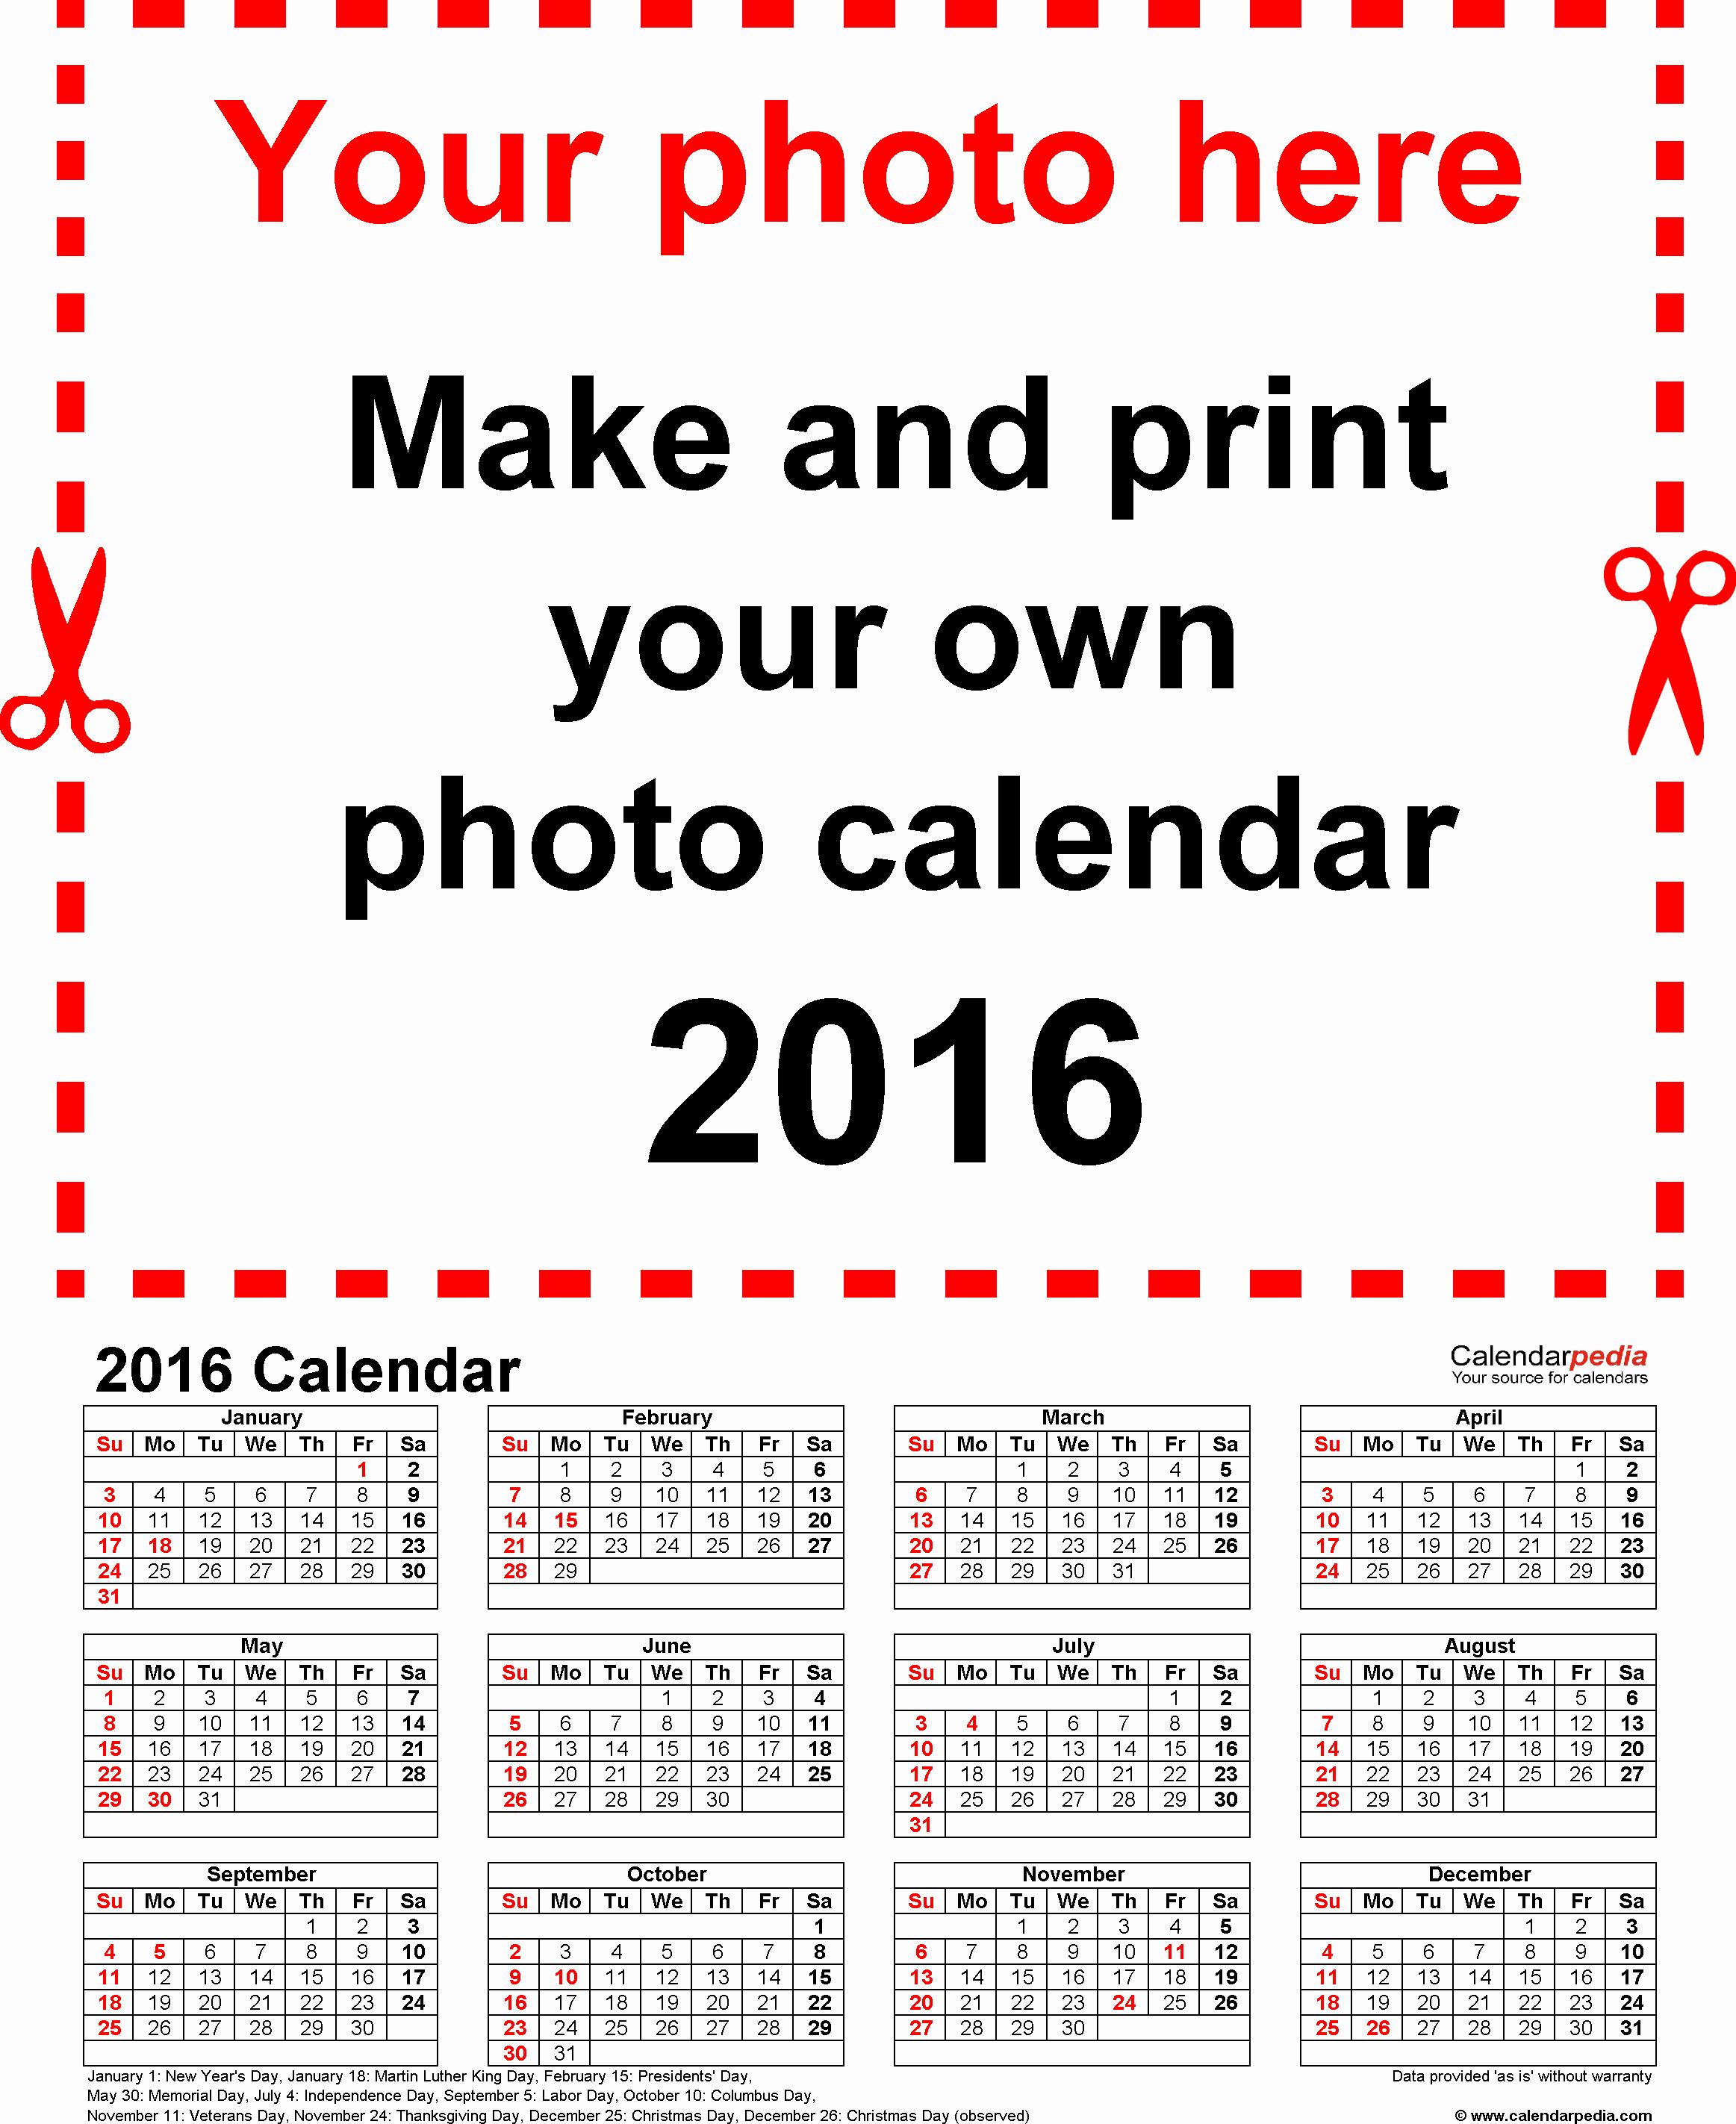 Free Year Calendar Template 2016 Elegant Calendar 2016 Free Printable Excel Templates